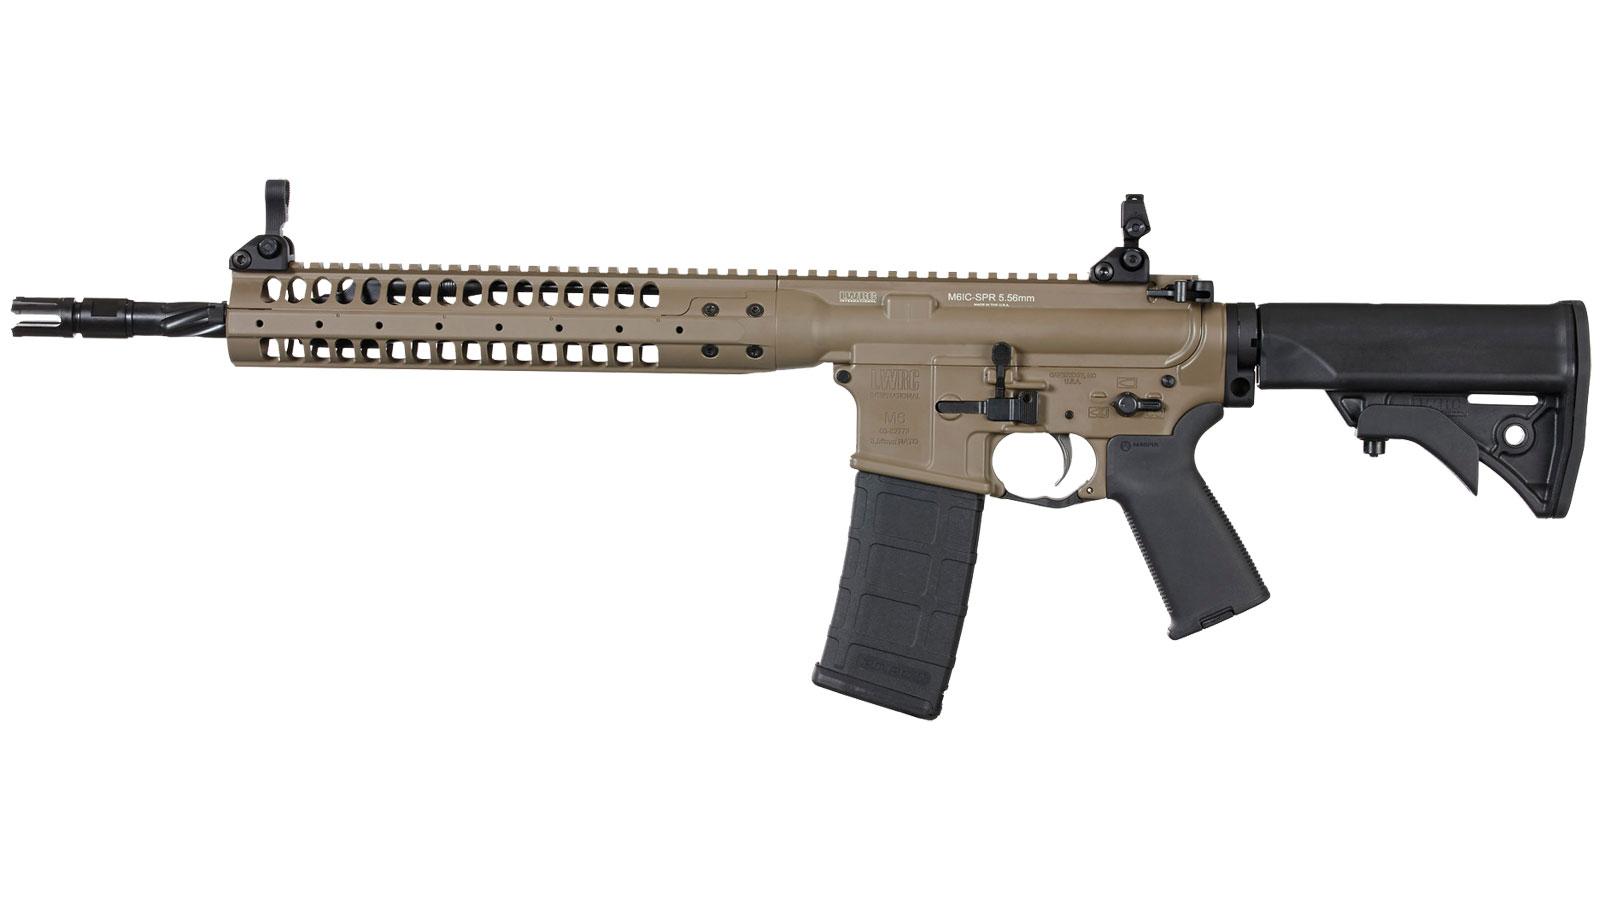 LWRC ICR5CK14PSPR Individual Carbine SPR Semi-Automatic 223 Remington|5.56 NATO 14.7 30+1 Adjustable Black Stk Flat Dark Earth in.